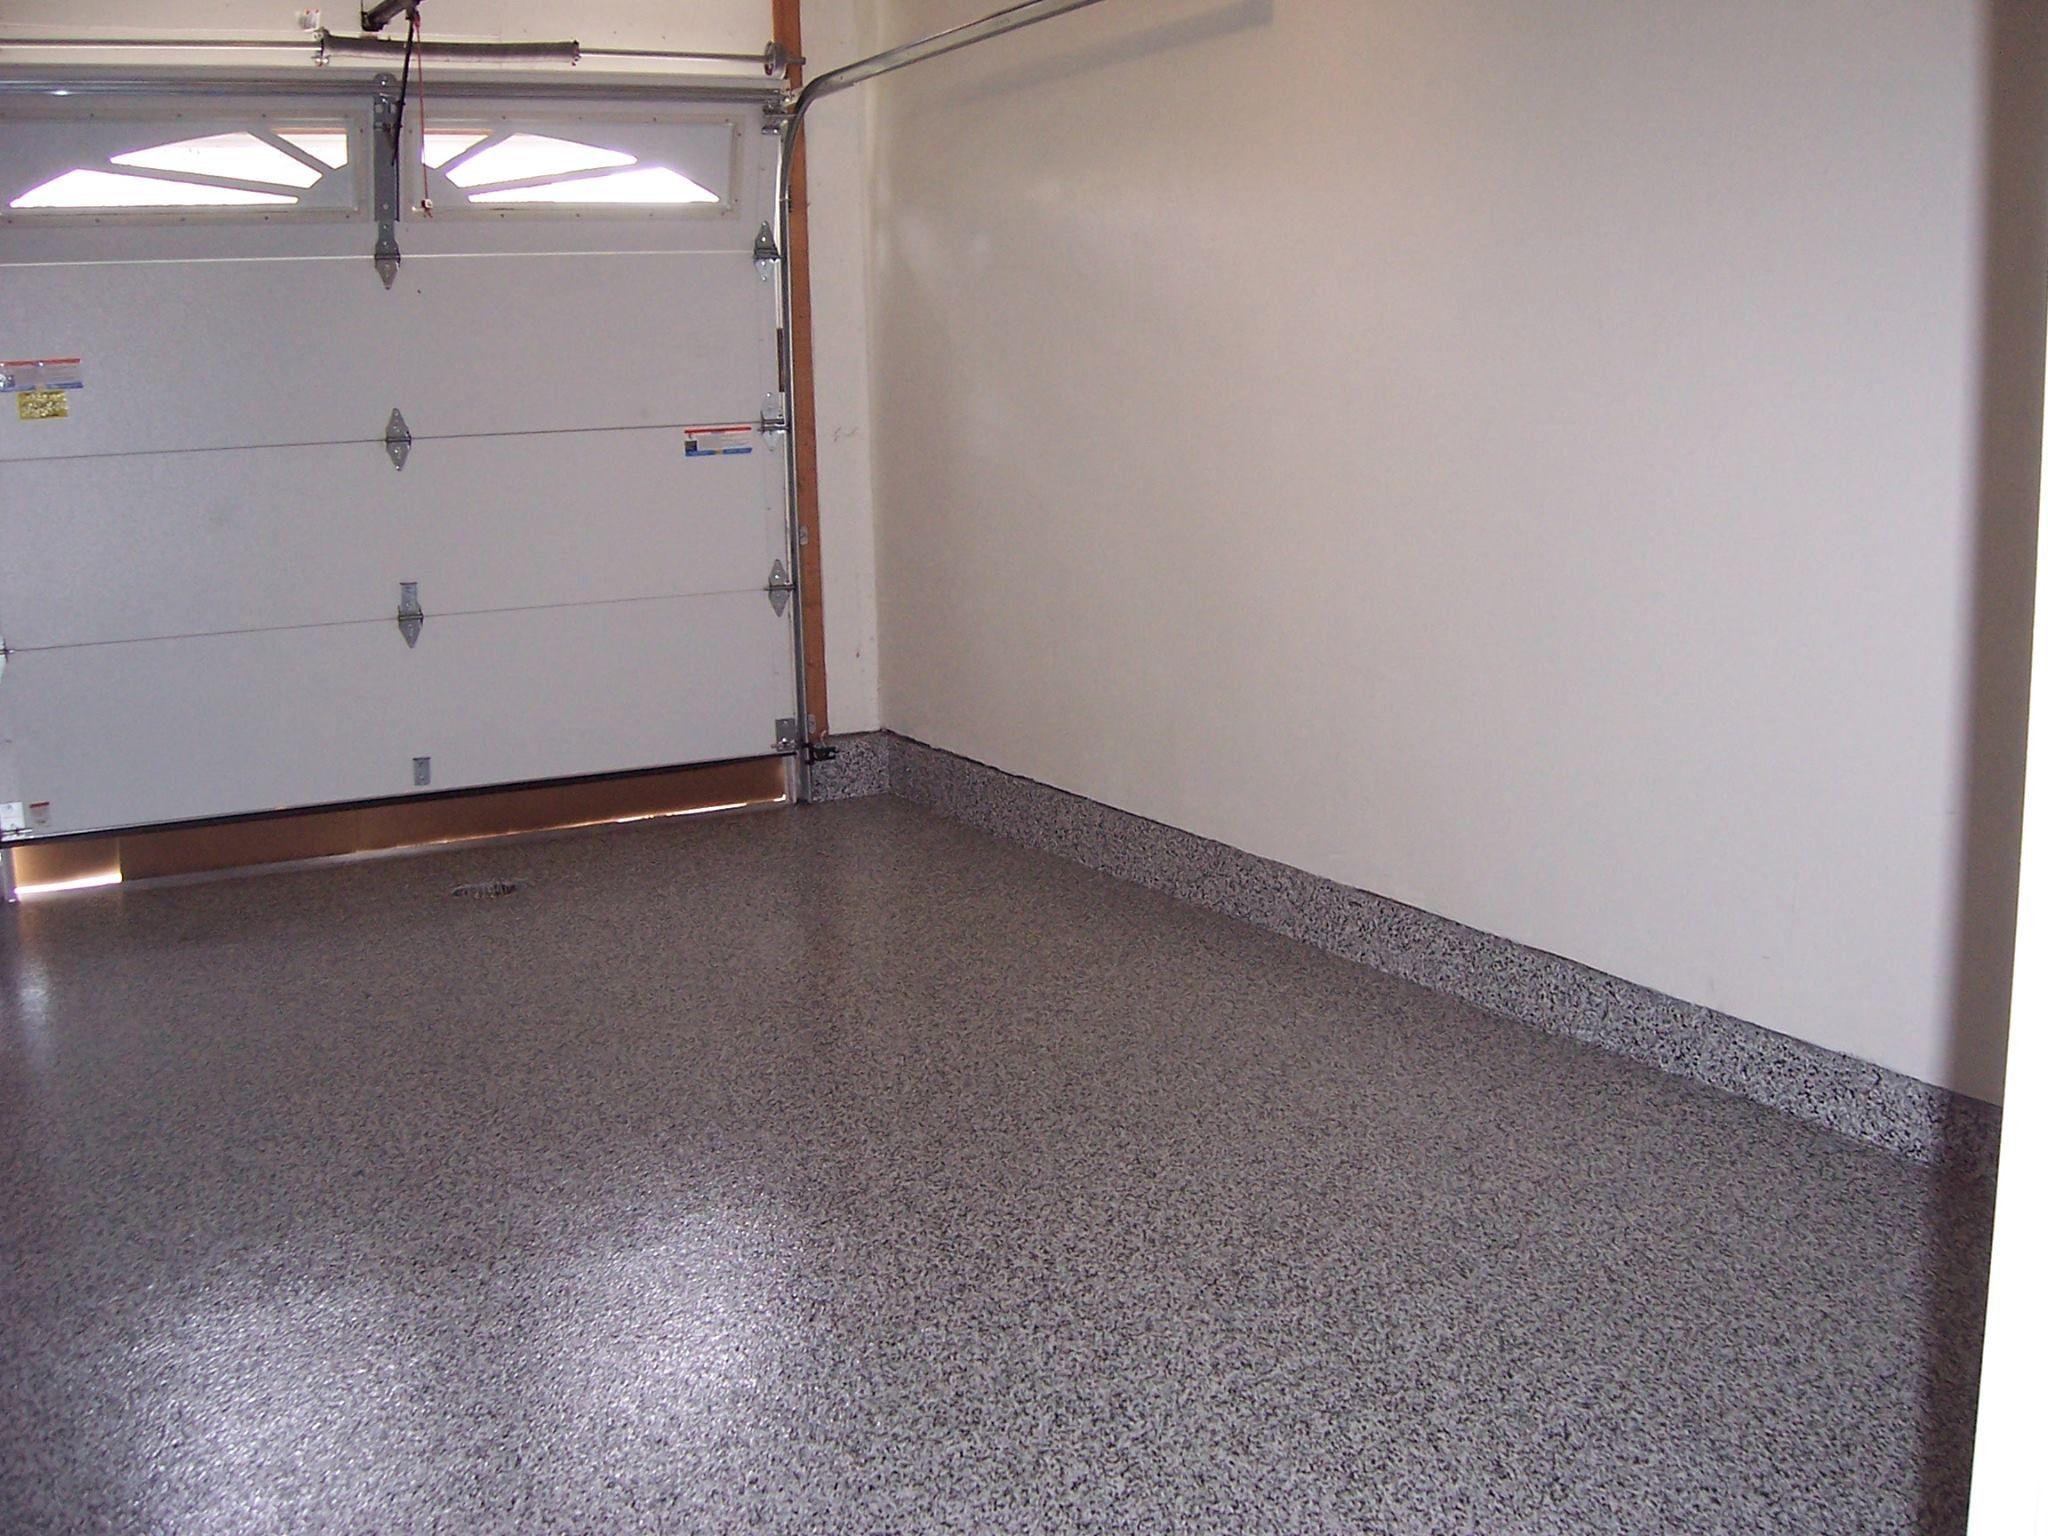 Graphite 1 4 Polyaspartic Floor With Stem Walls Polyaspartic Flooring Flake Floor Garage Graphite Flooring Interior Shutters Custom Closets